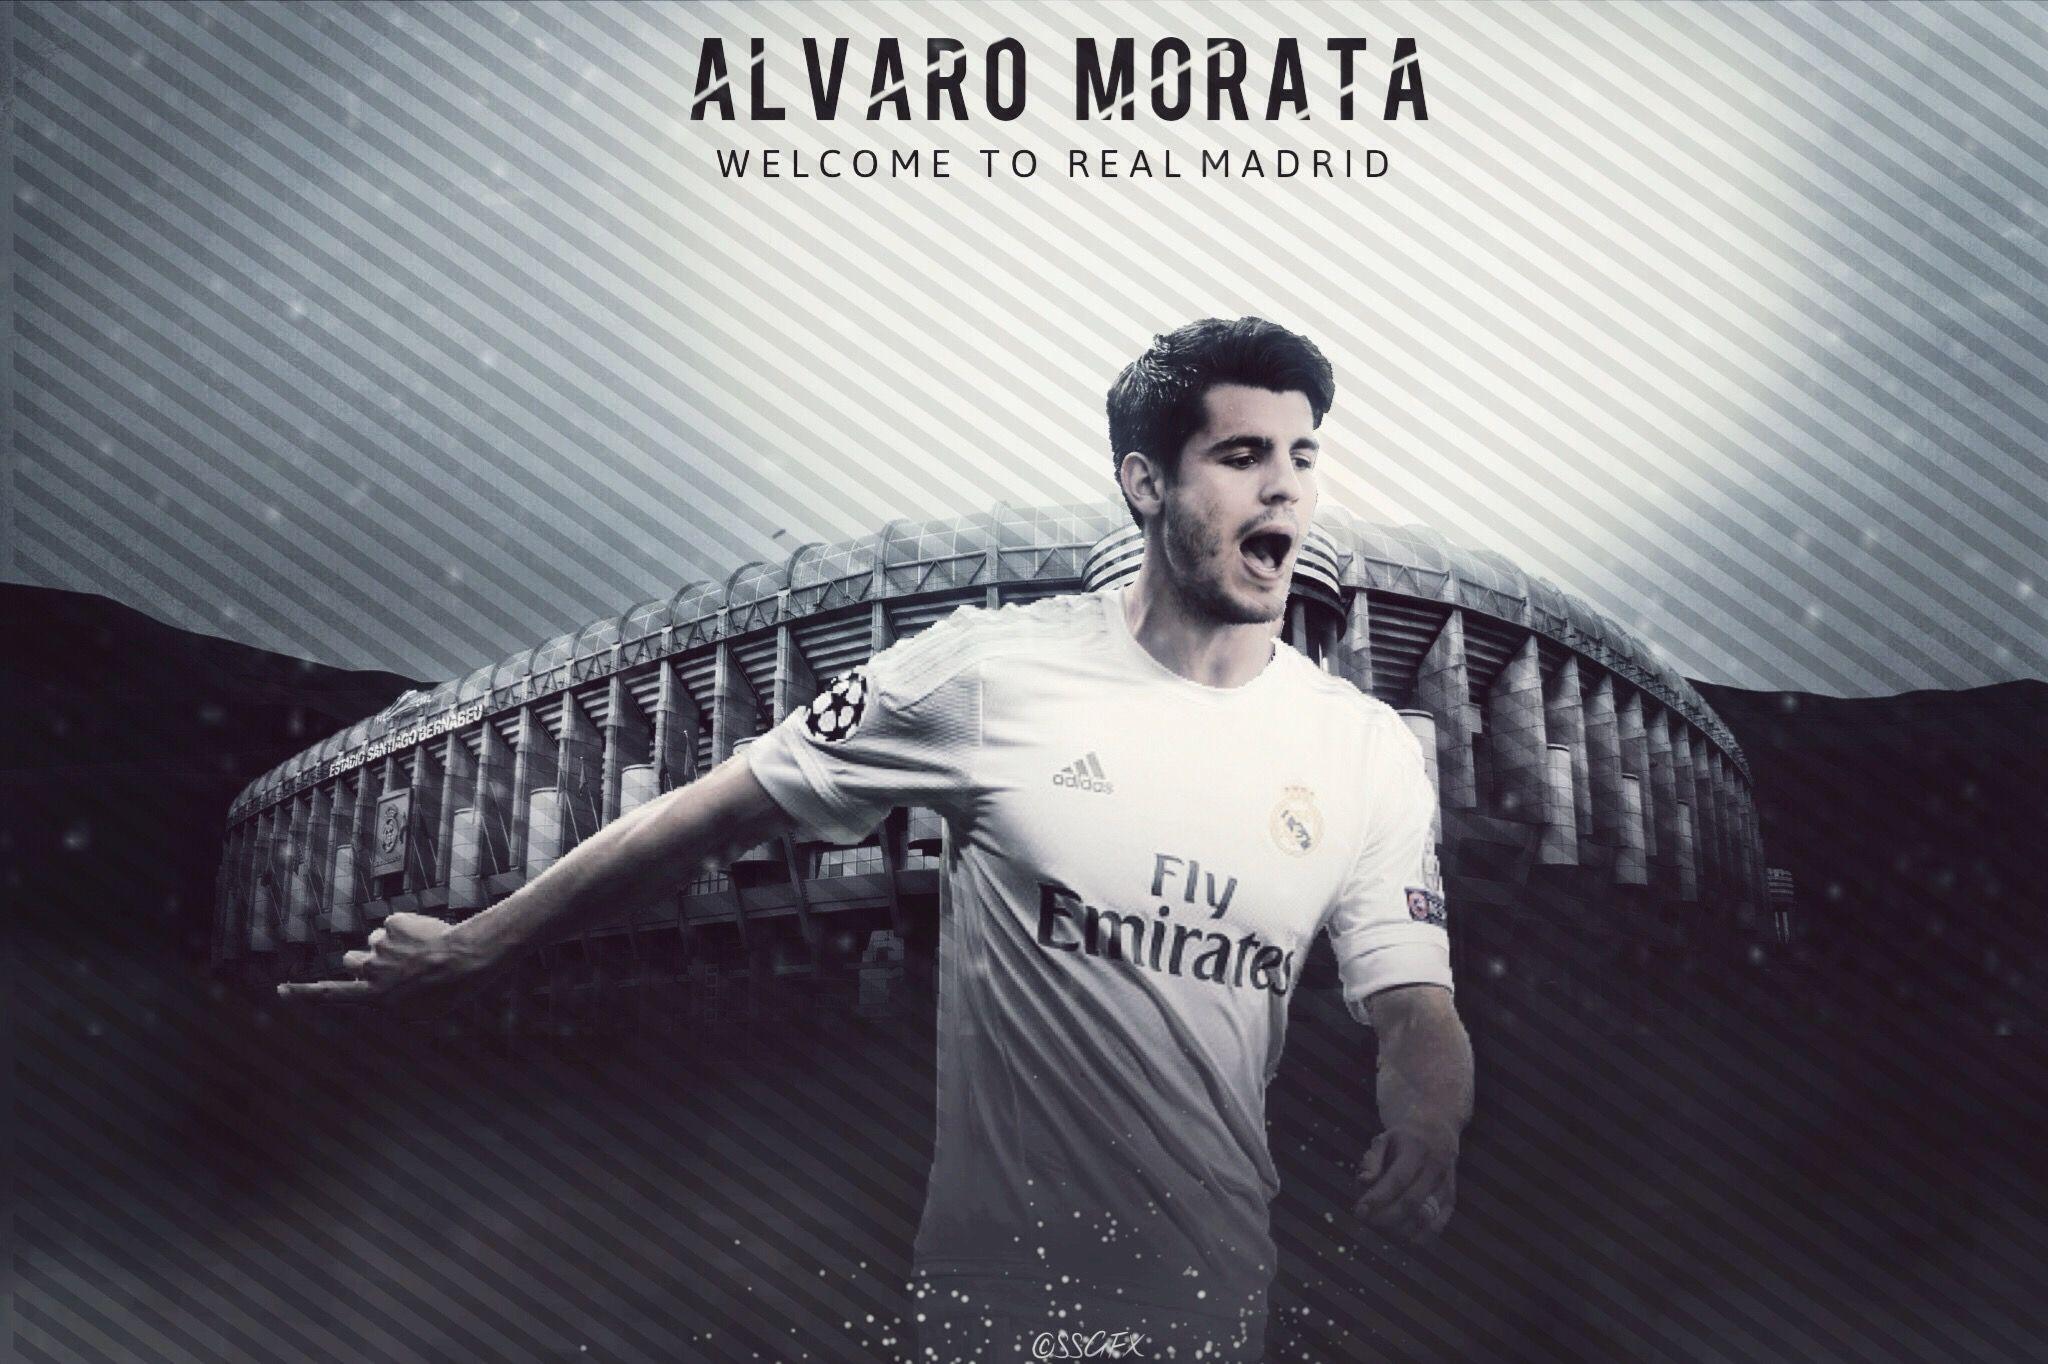 Alvaro Morata Wallpapers